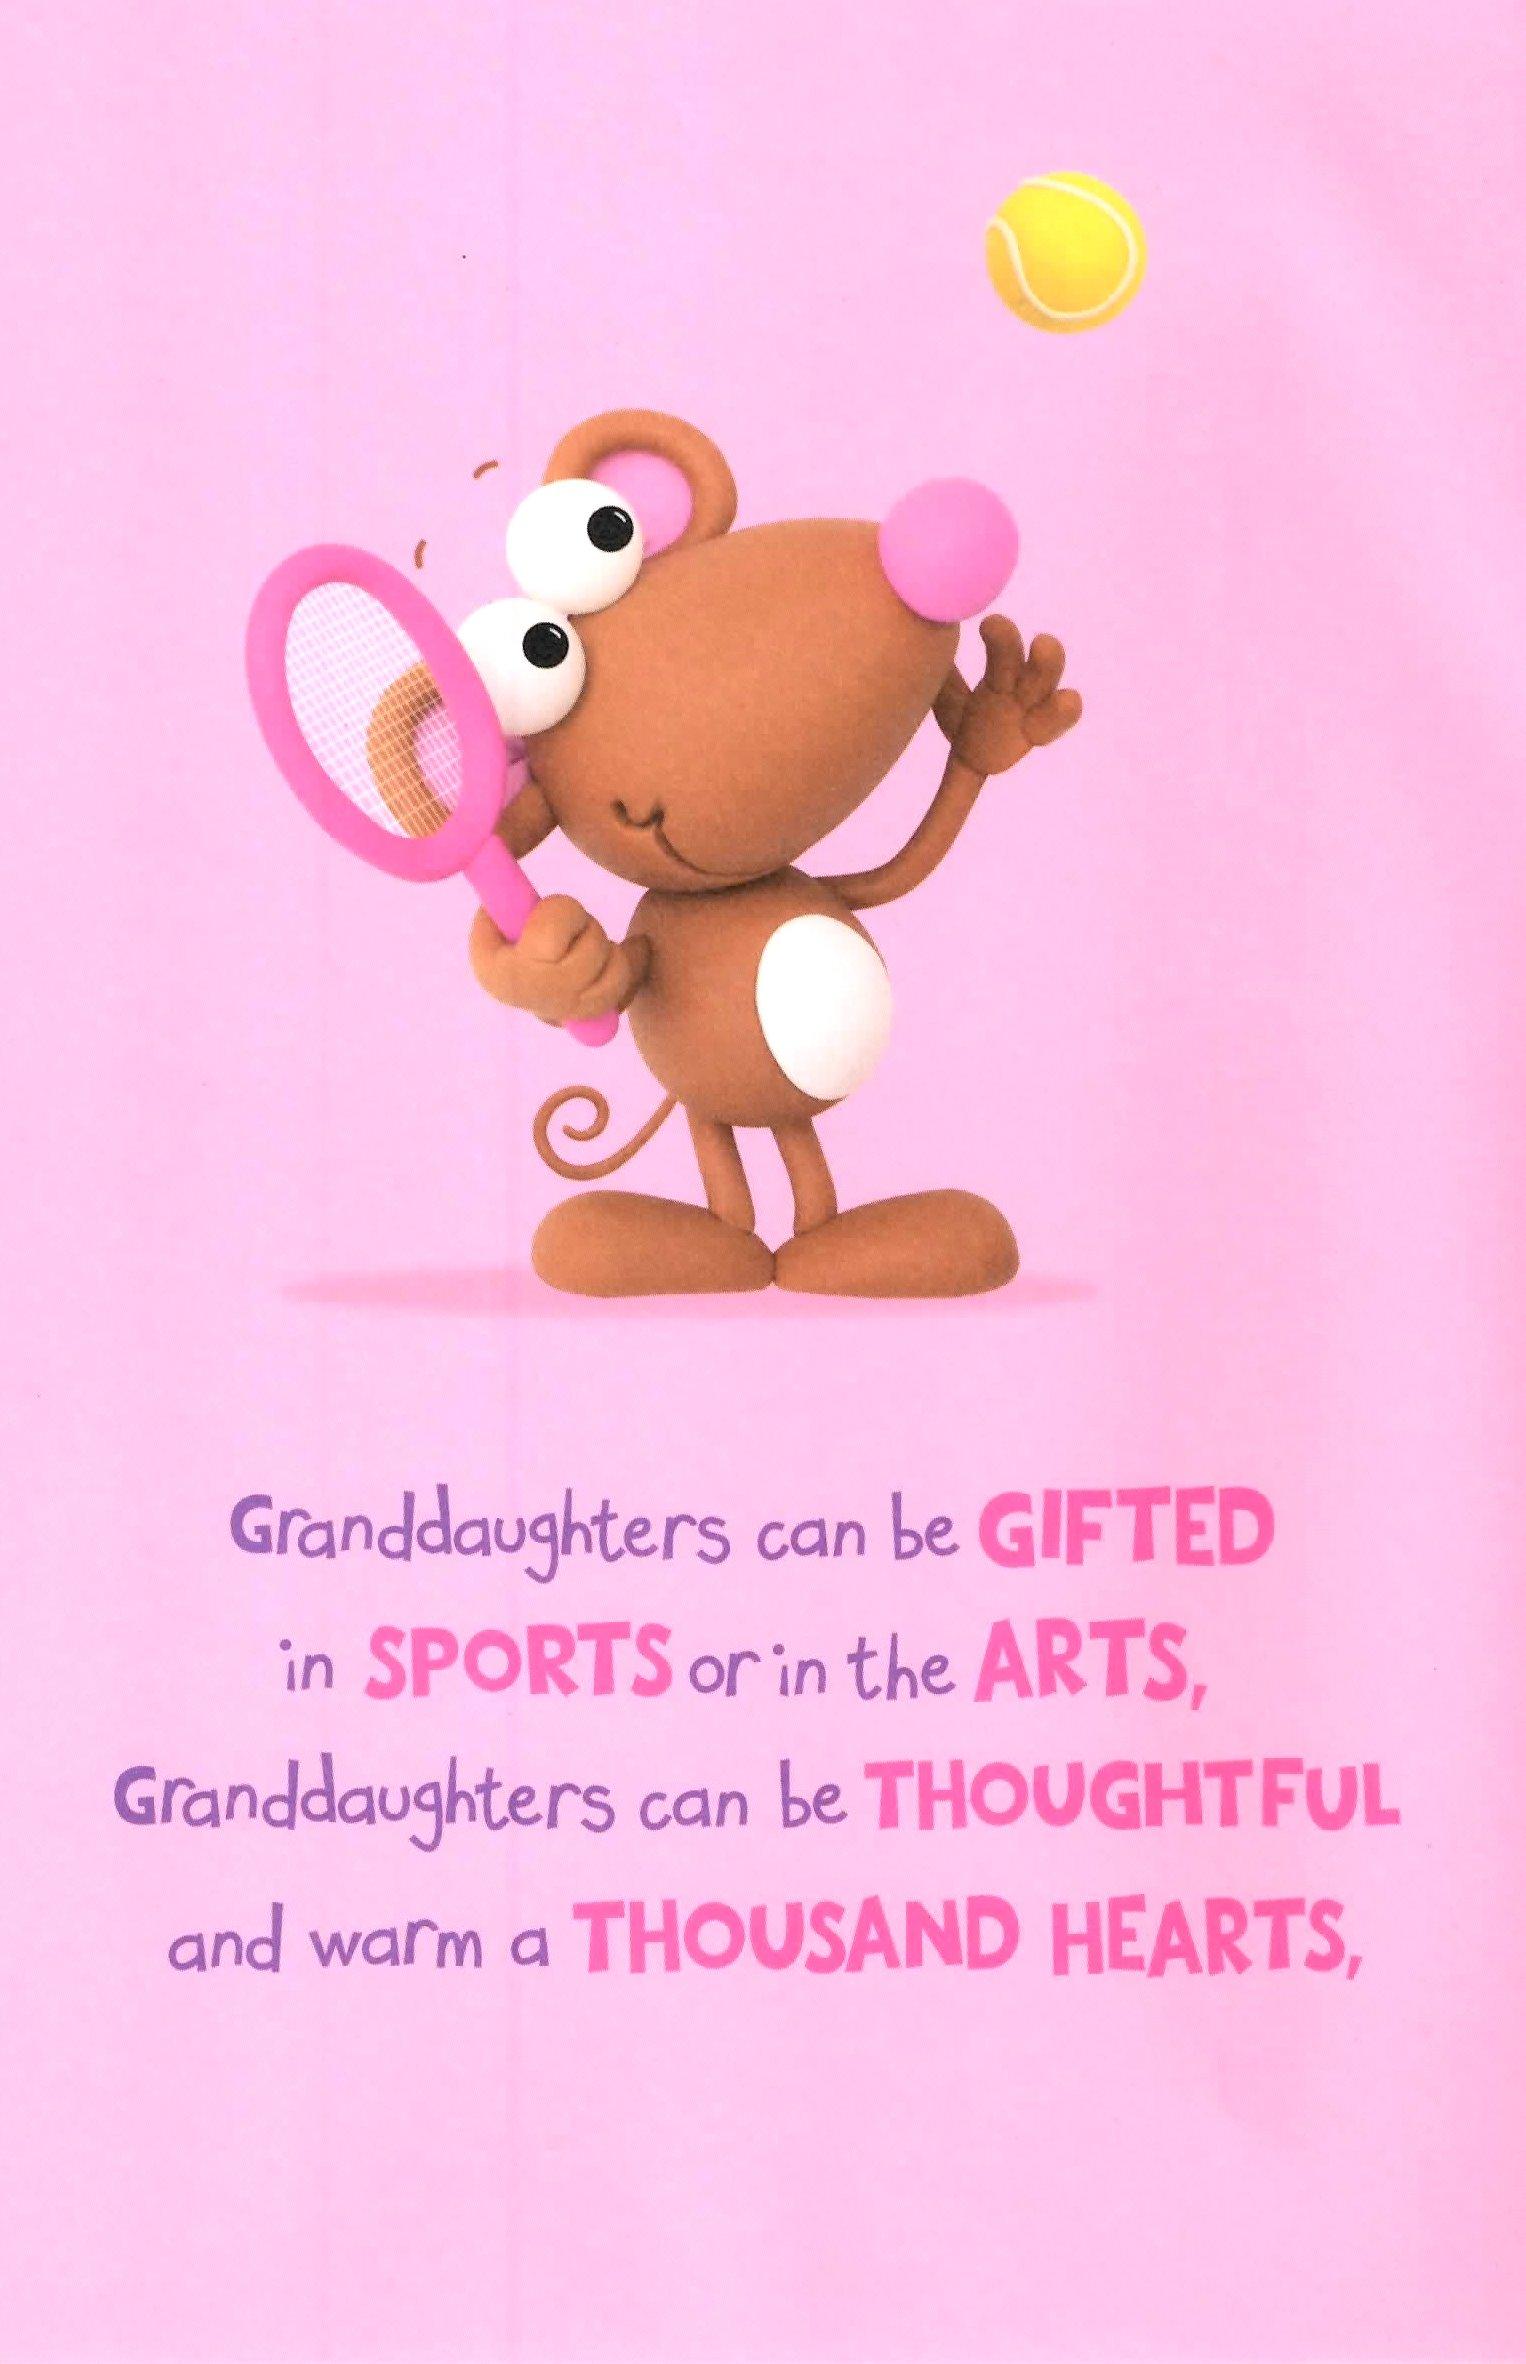 Cute Wonderful Granddaughter Birthday Greeting Card Crackers Range Cards NEW EBay